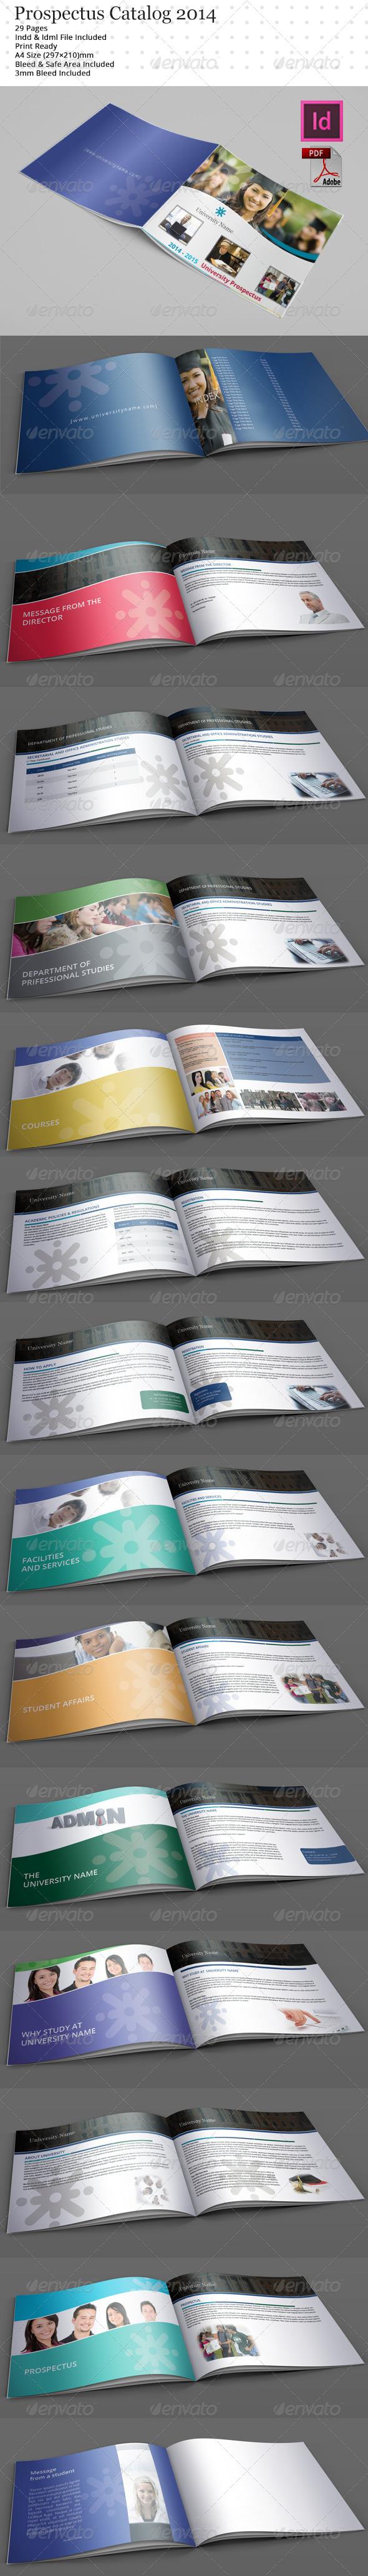 Prospectus Catalog Templates 2014 - Catalogs Brochures